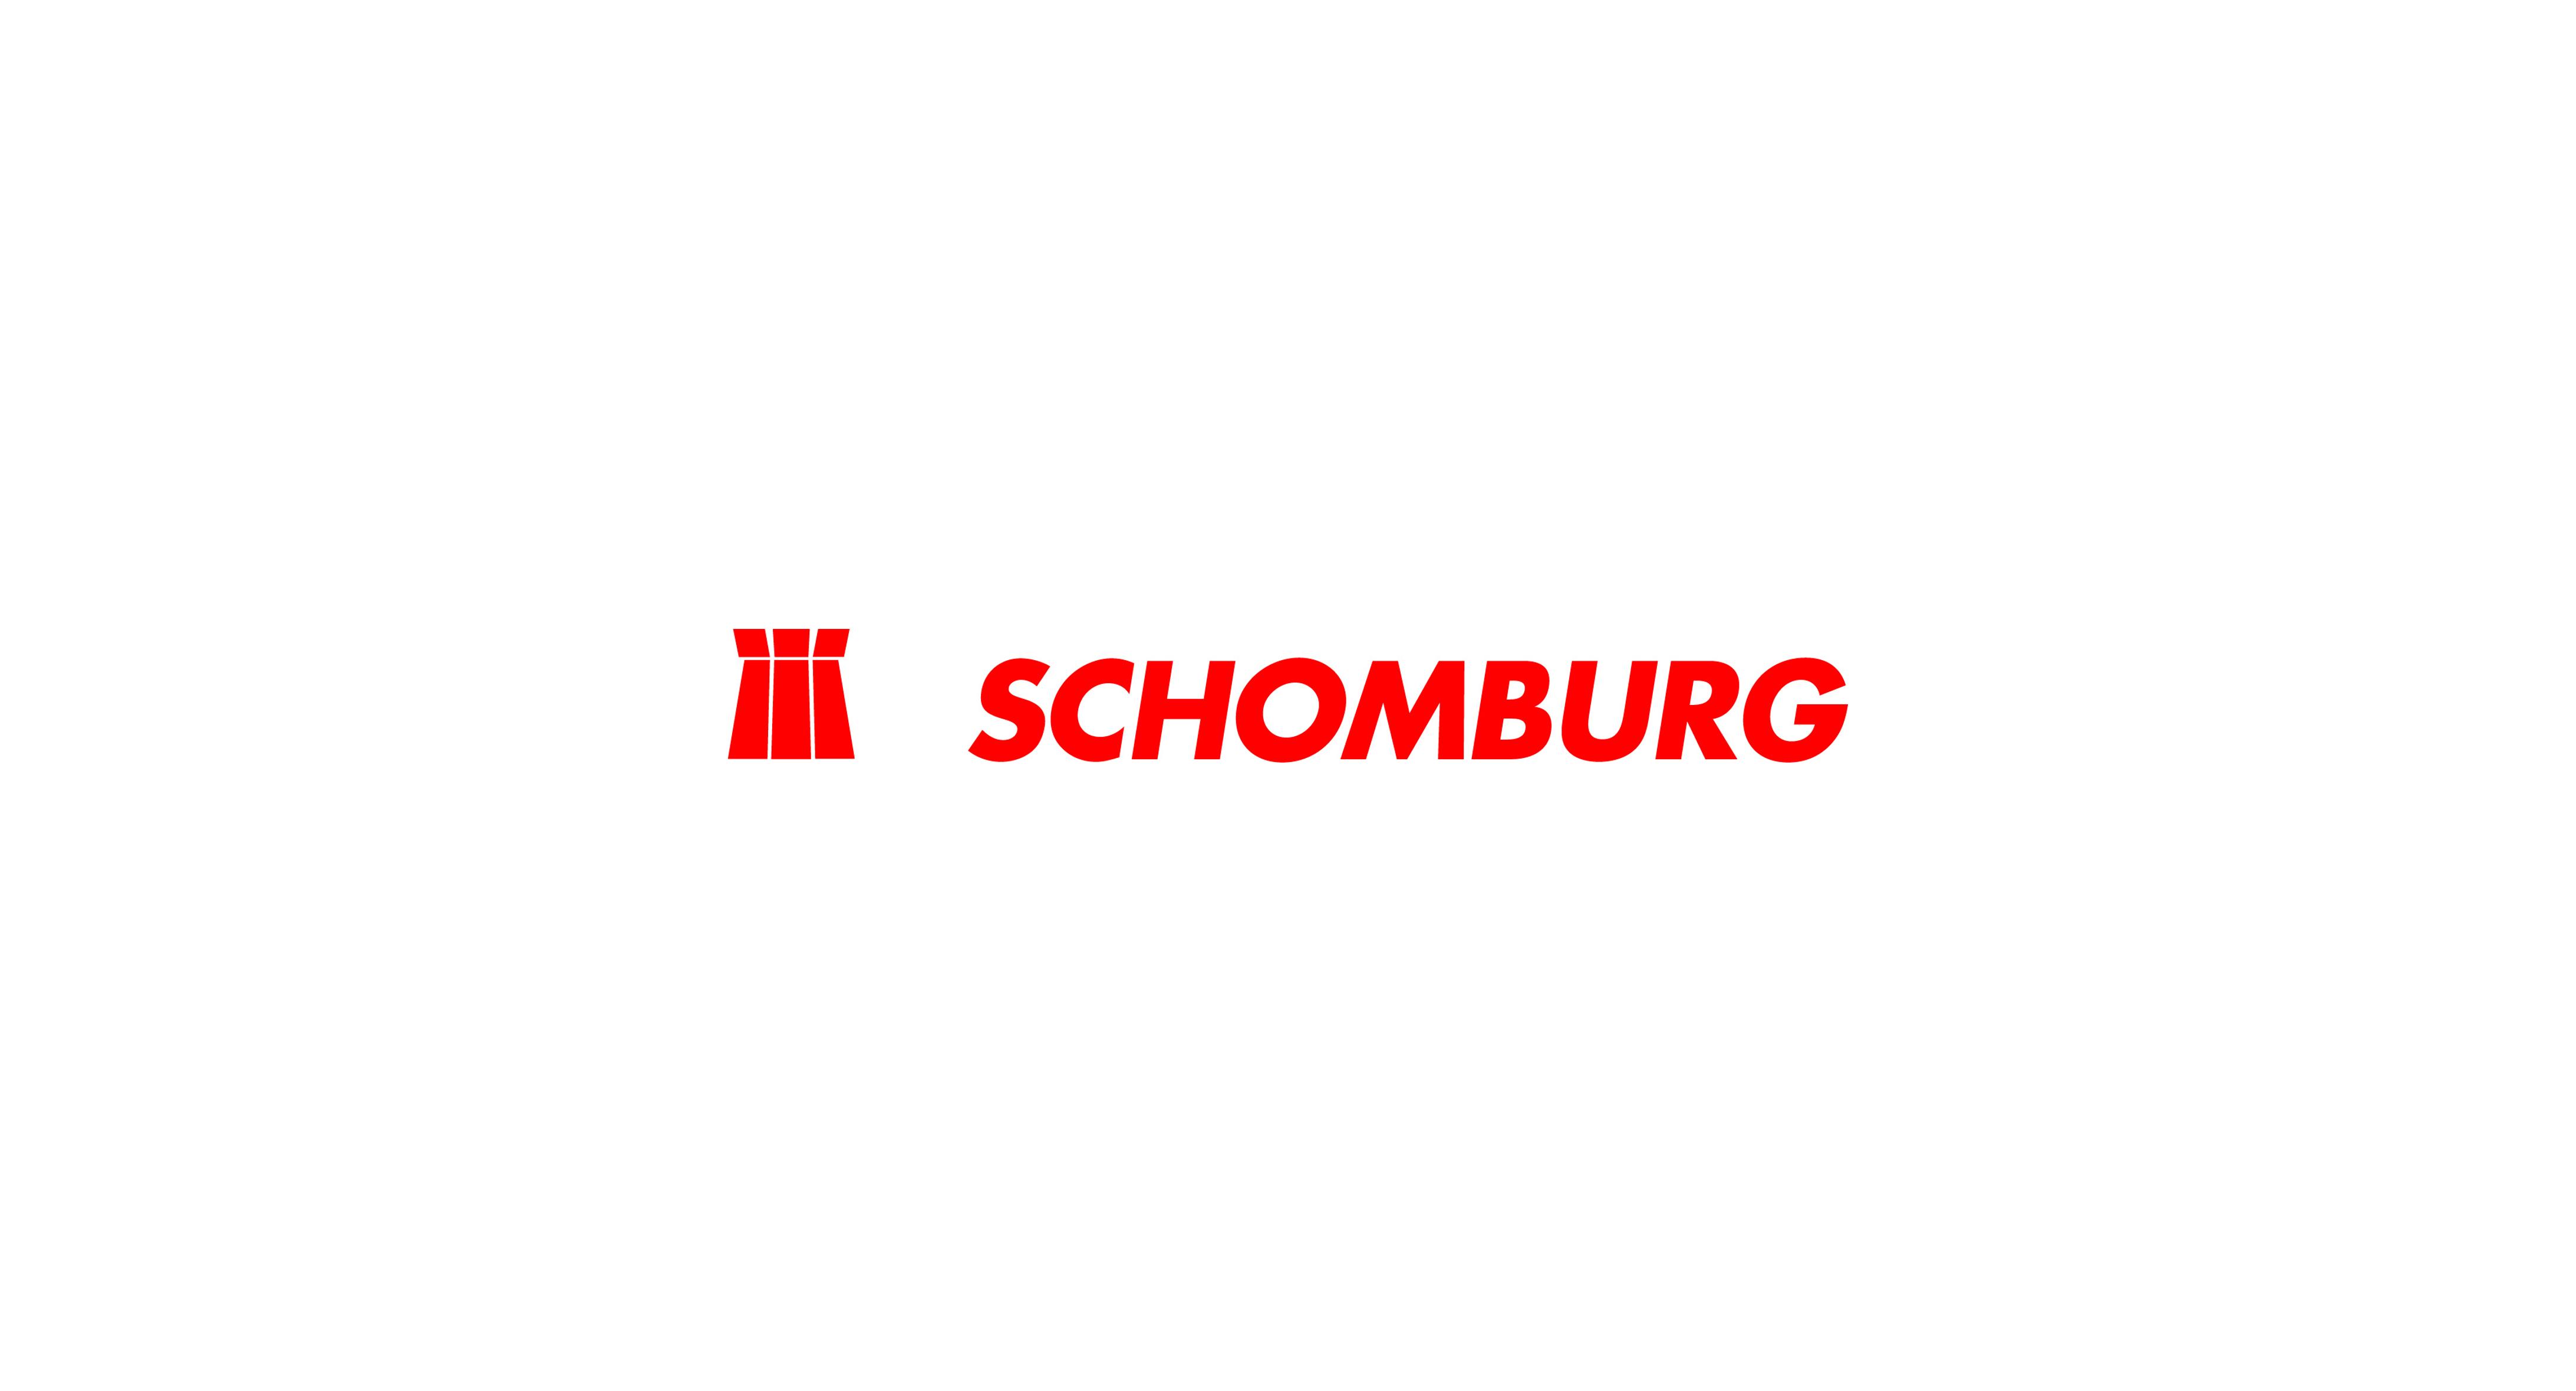 043_schomburg_logo